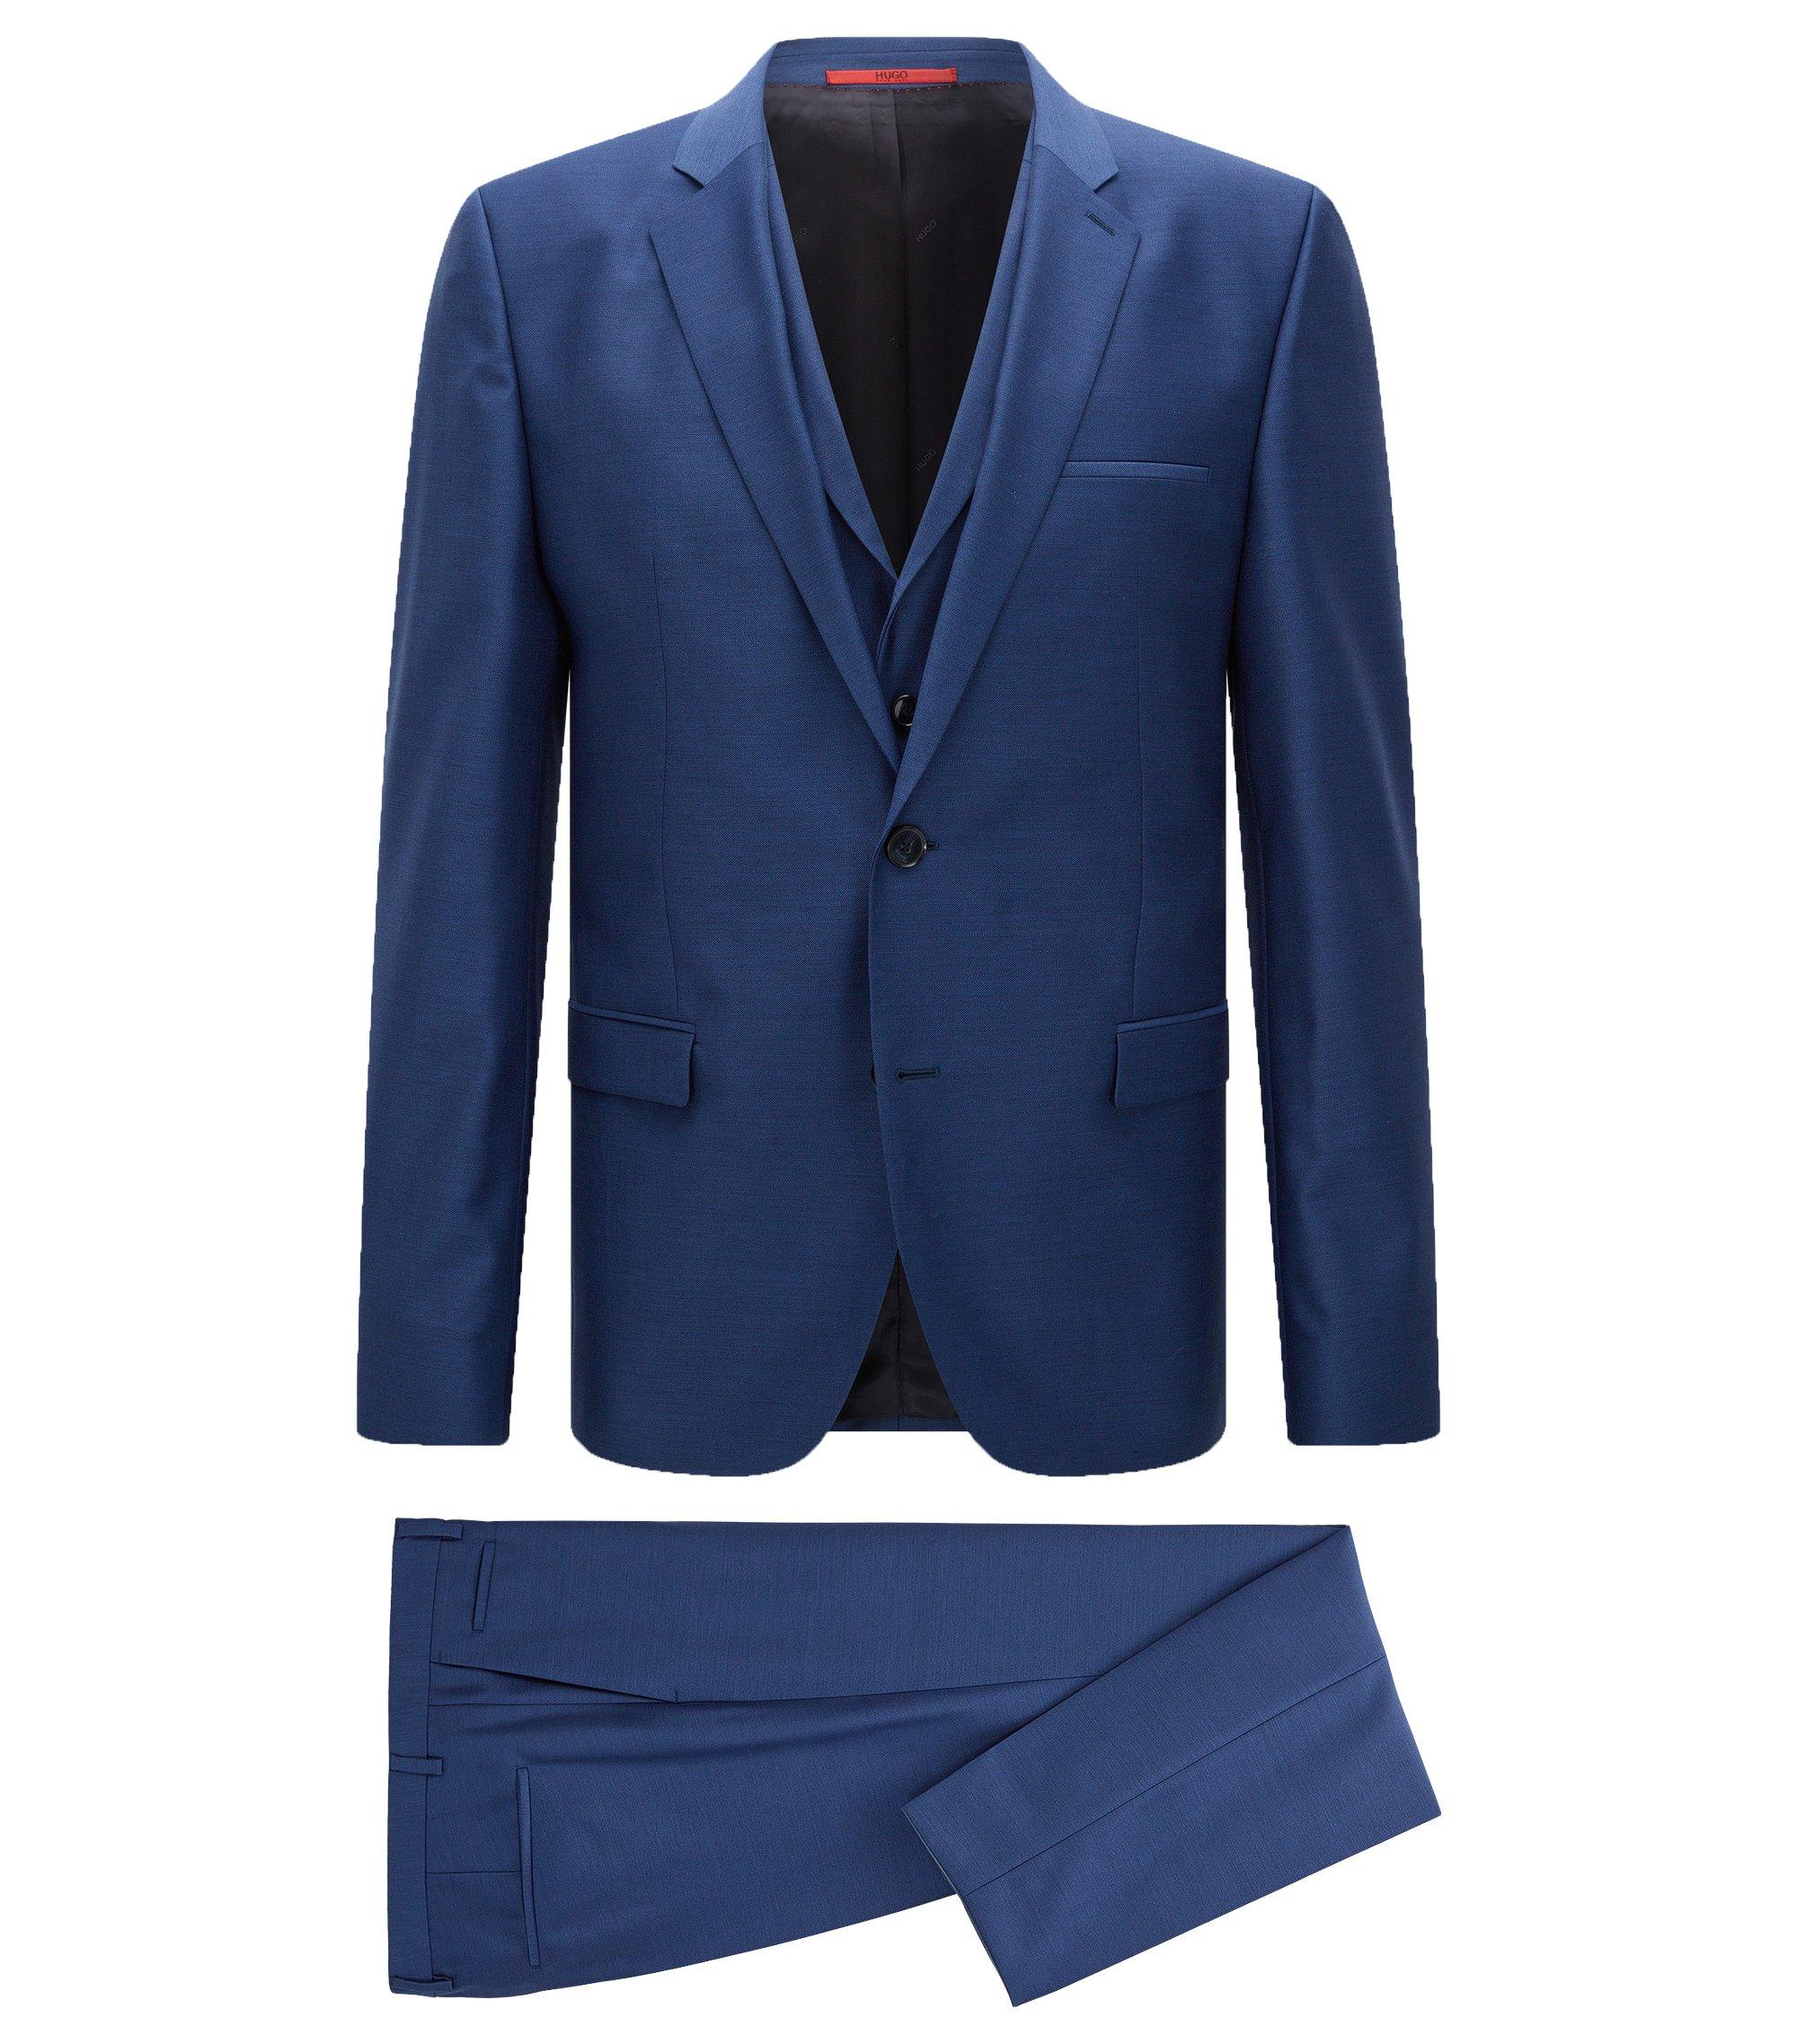 Abito extra slim fit con gilet in lana vergine, Blu